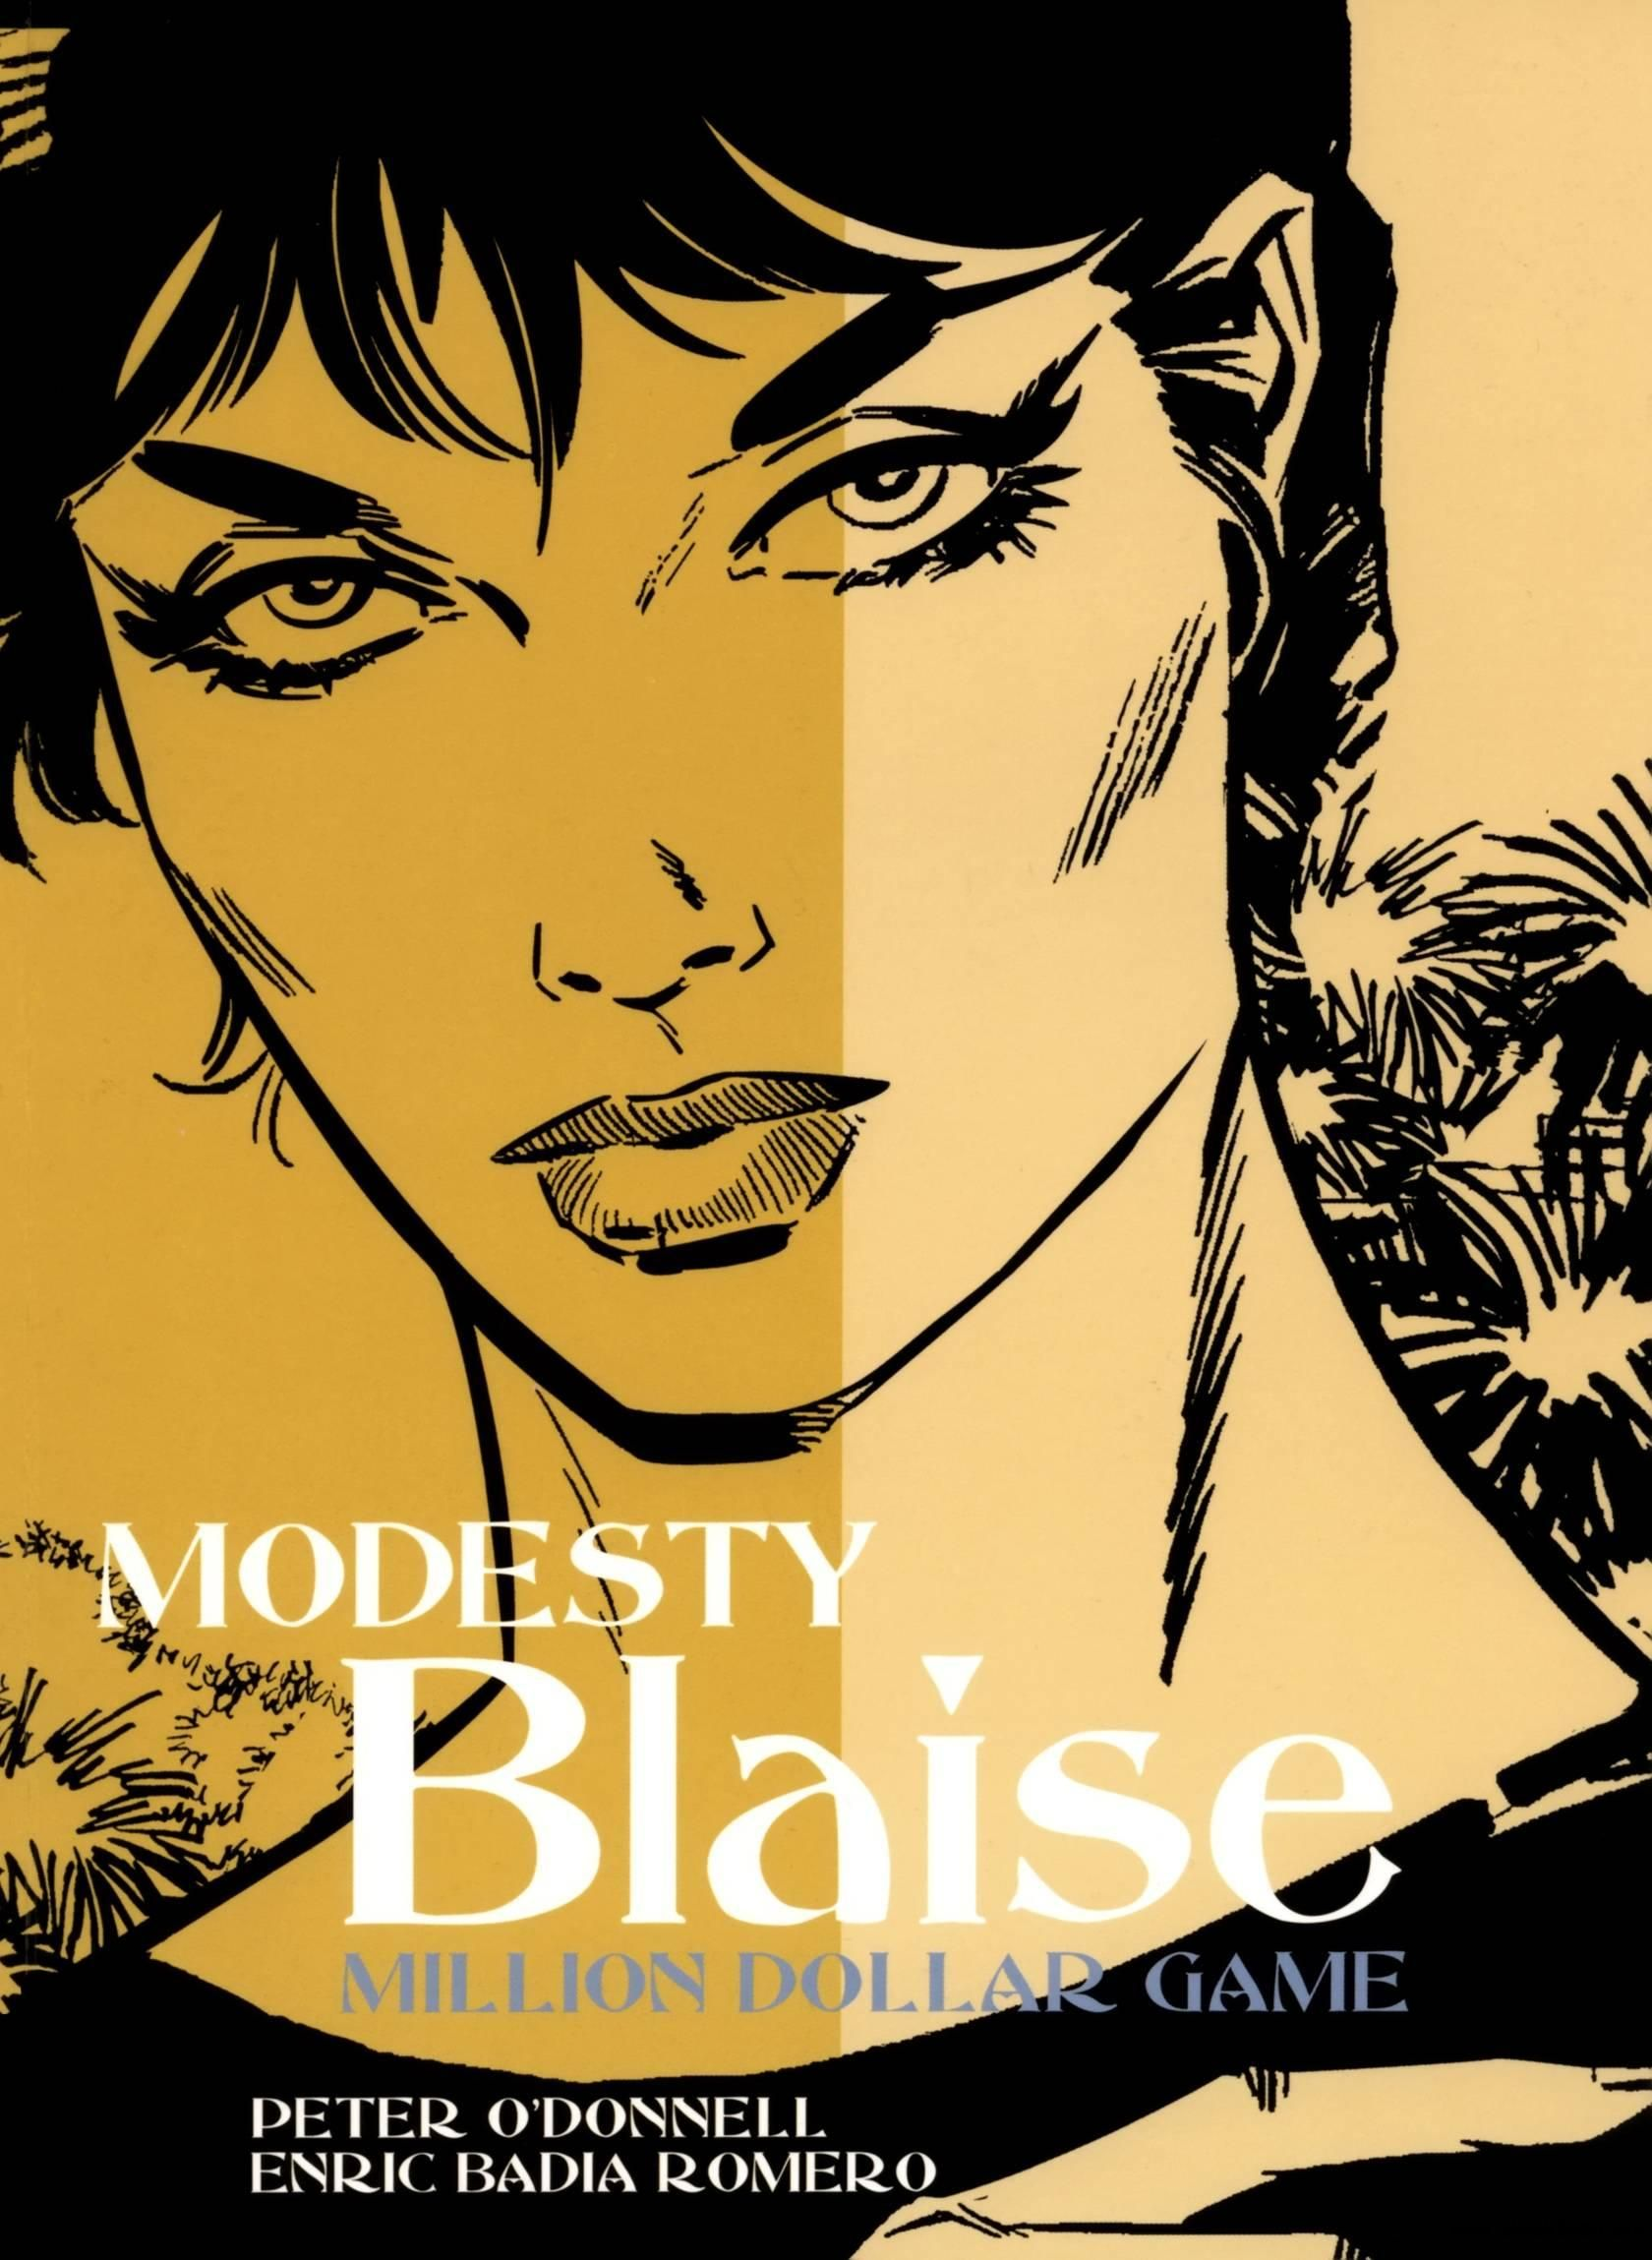 Modesty Blaise  Billion Dollar Game cover  by Enric Badia Romero